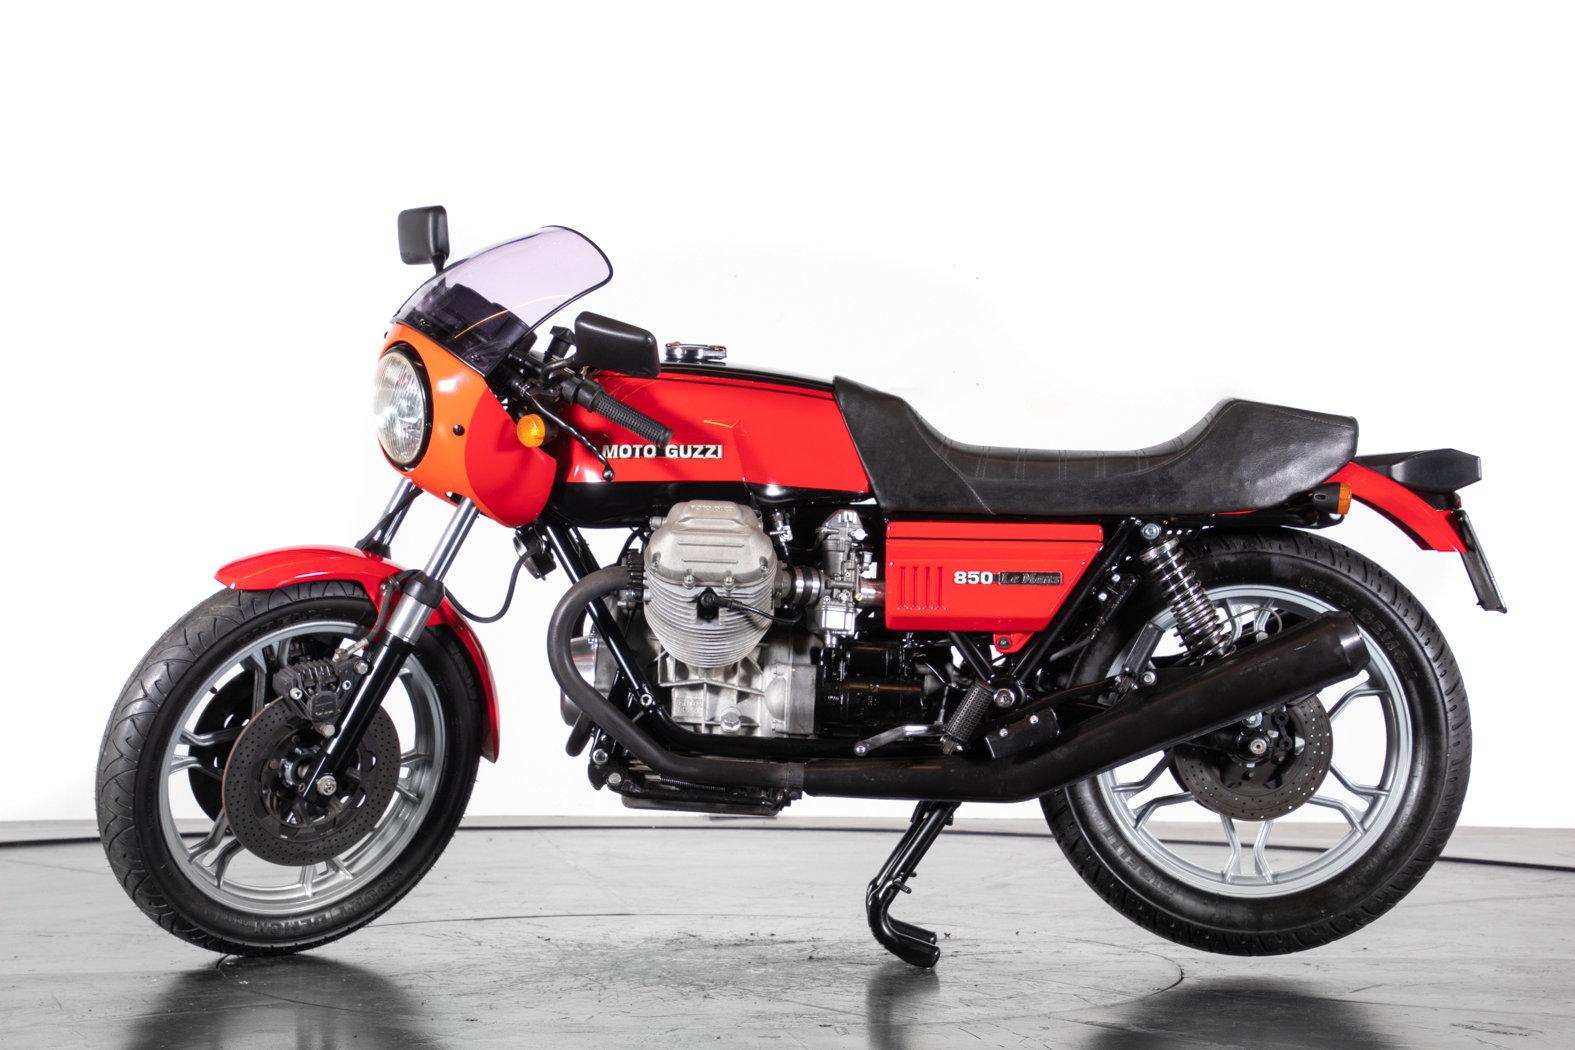 MOTO GUZZI - 850 LE MANS - 1977 For Sale (picture 1 of 6)